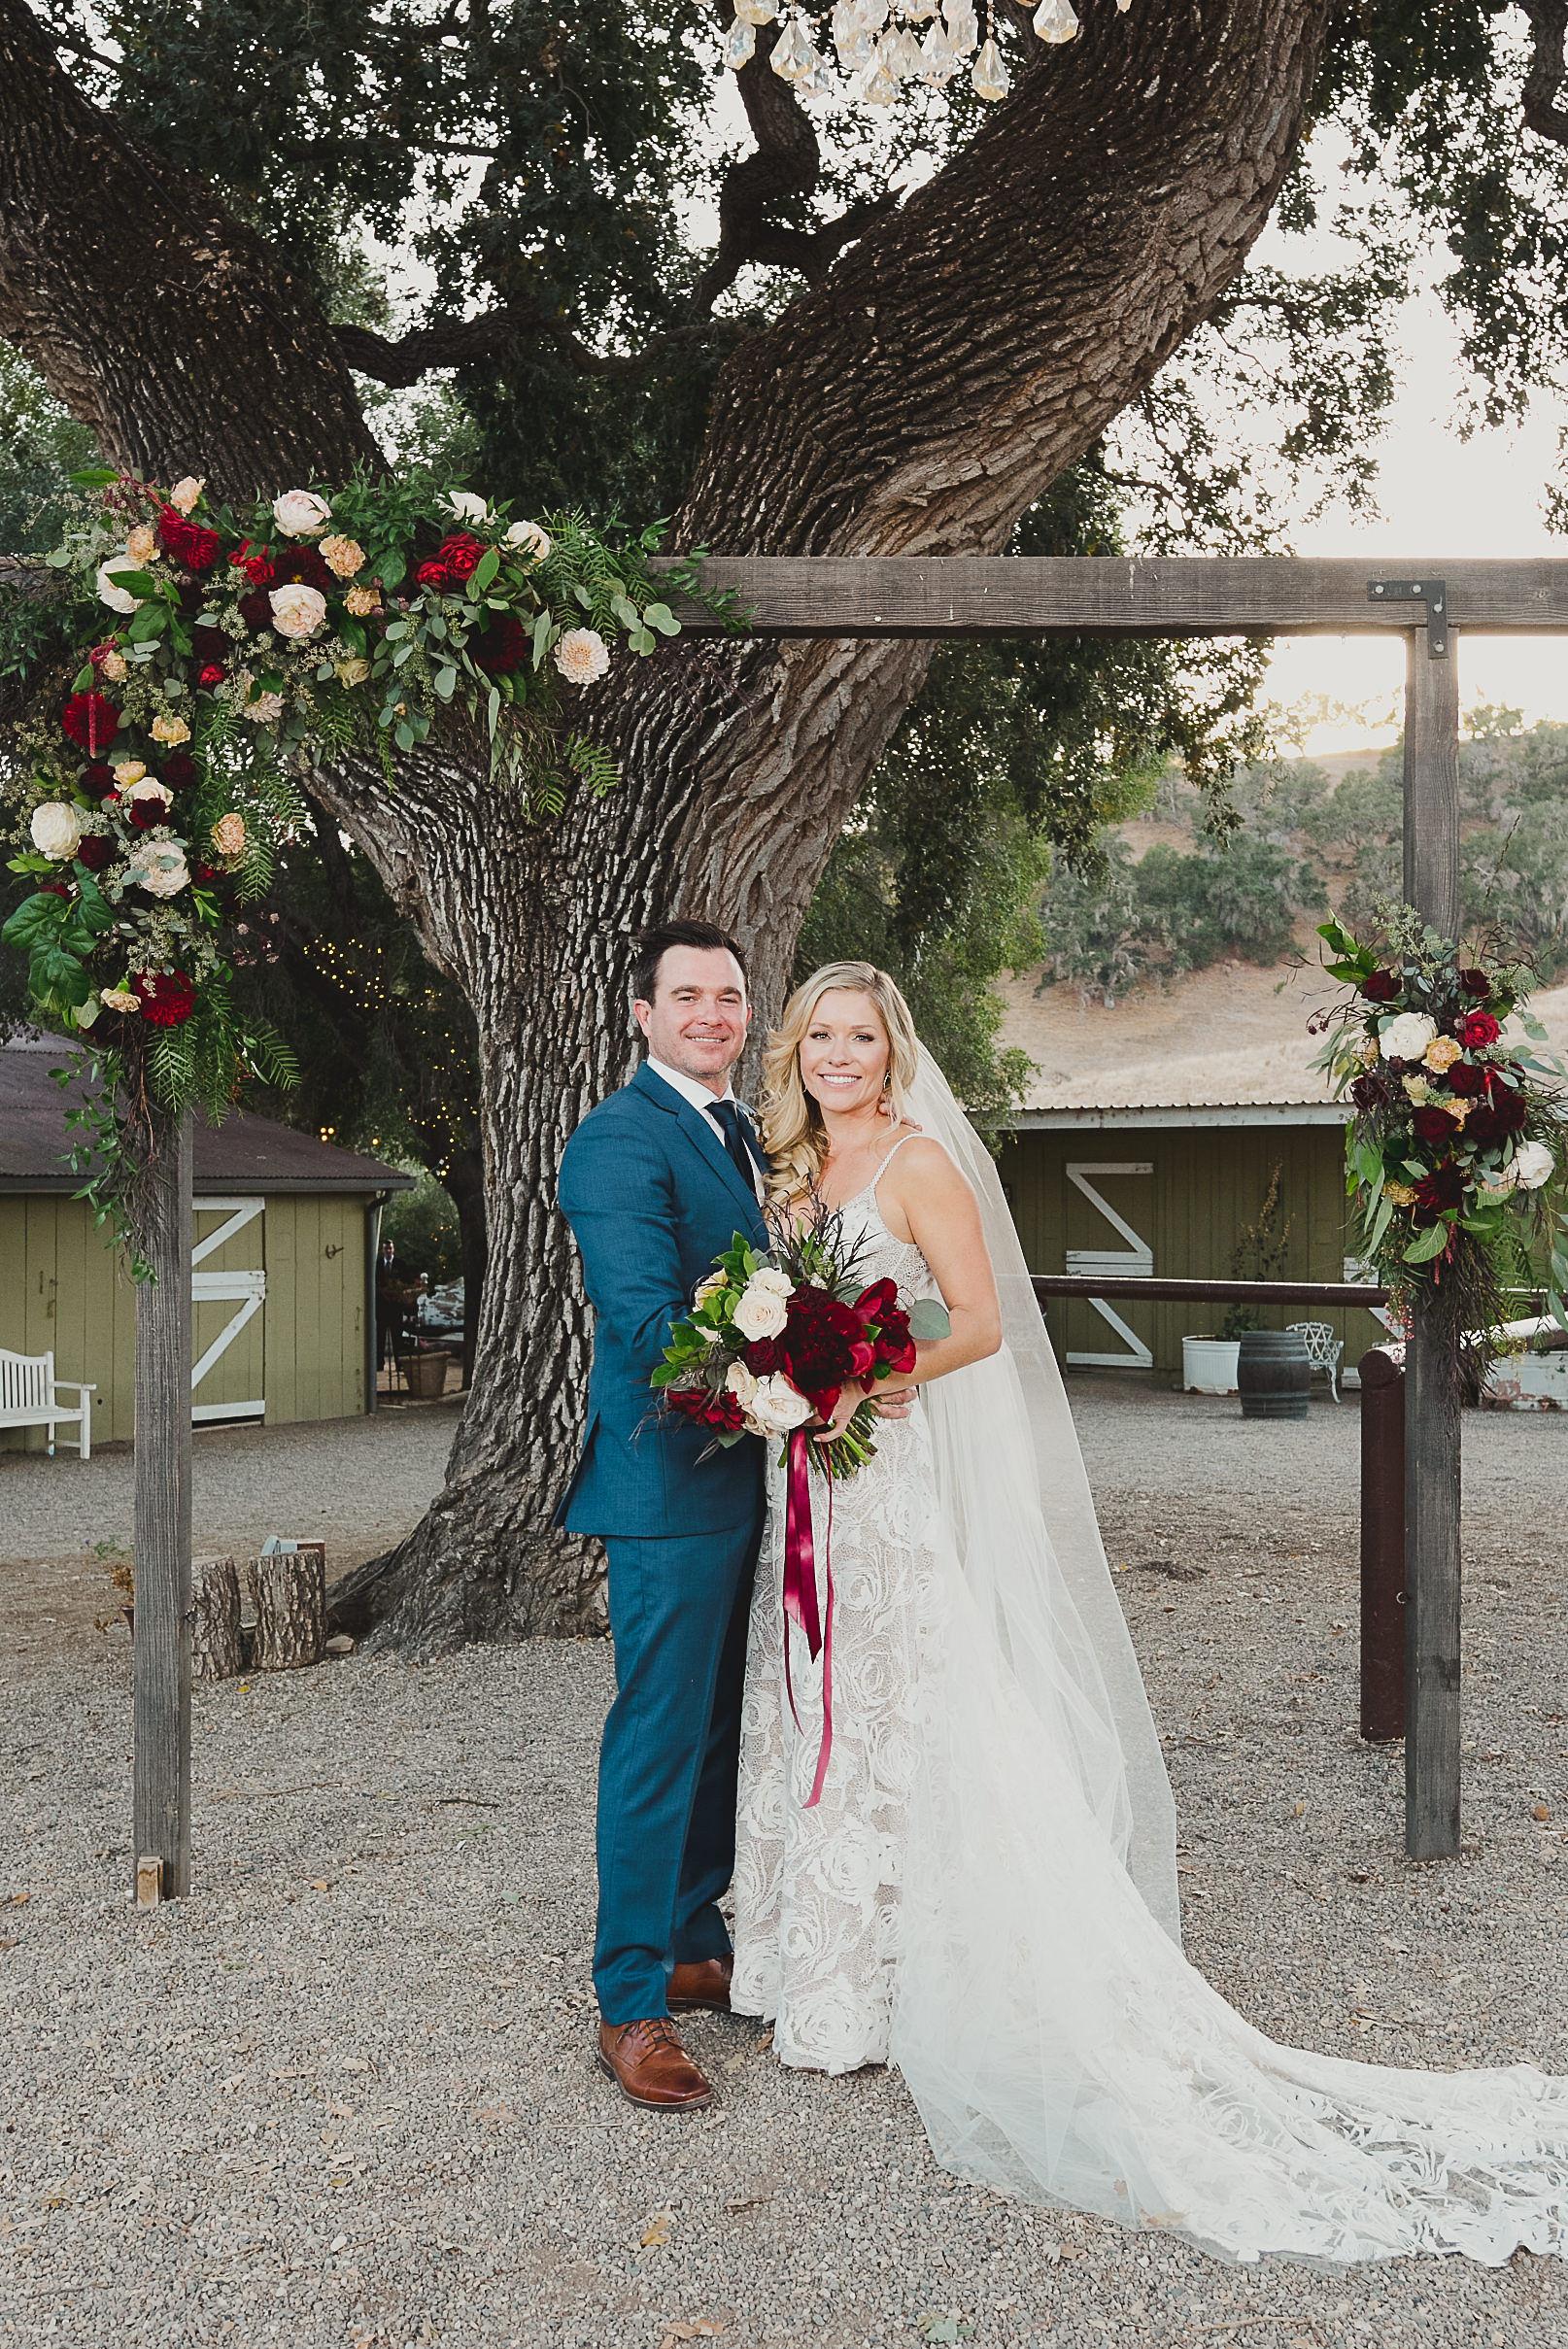 181026-Marisa-JB-Wedding-4961-2.jpg